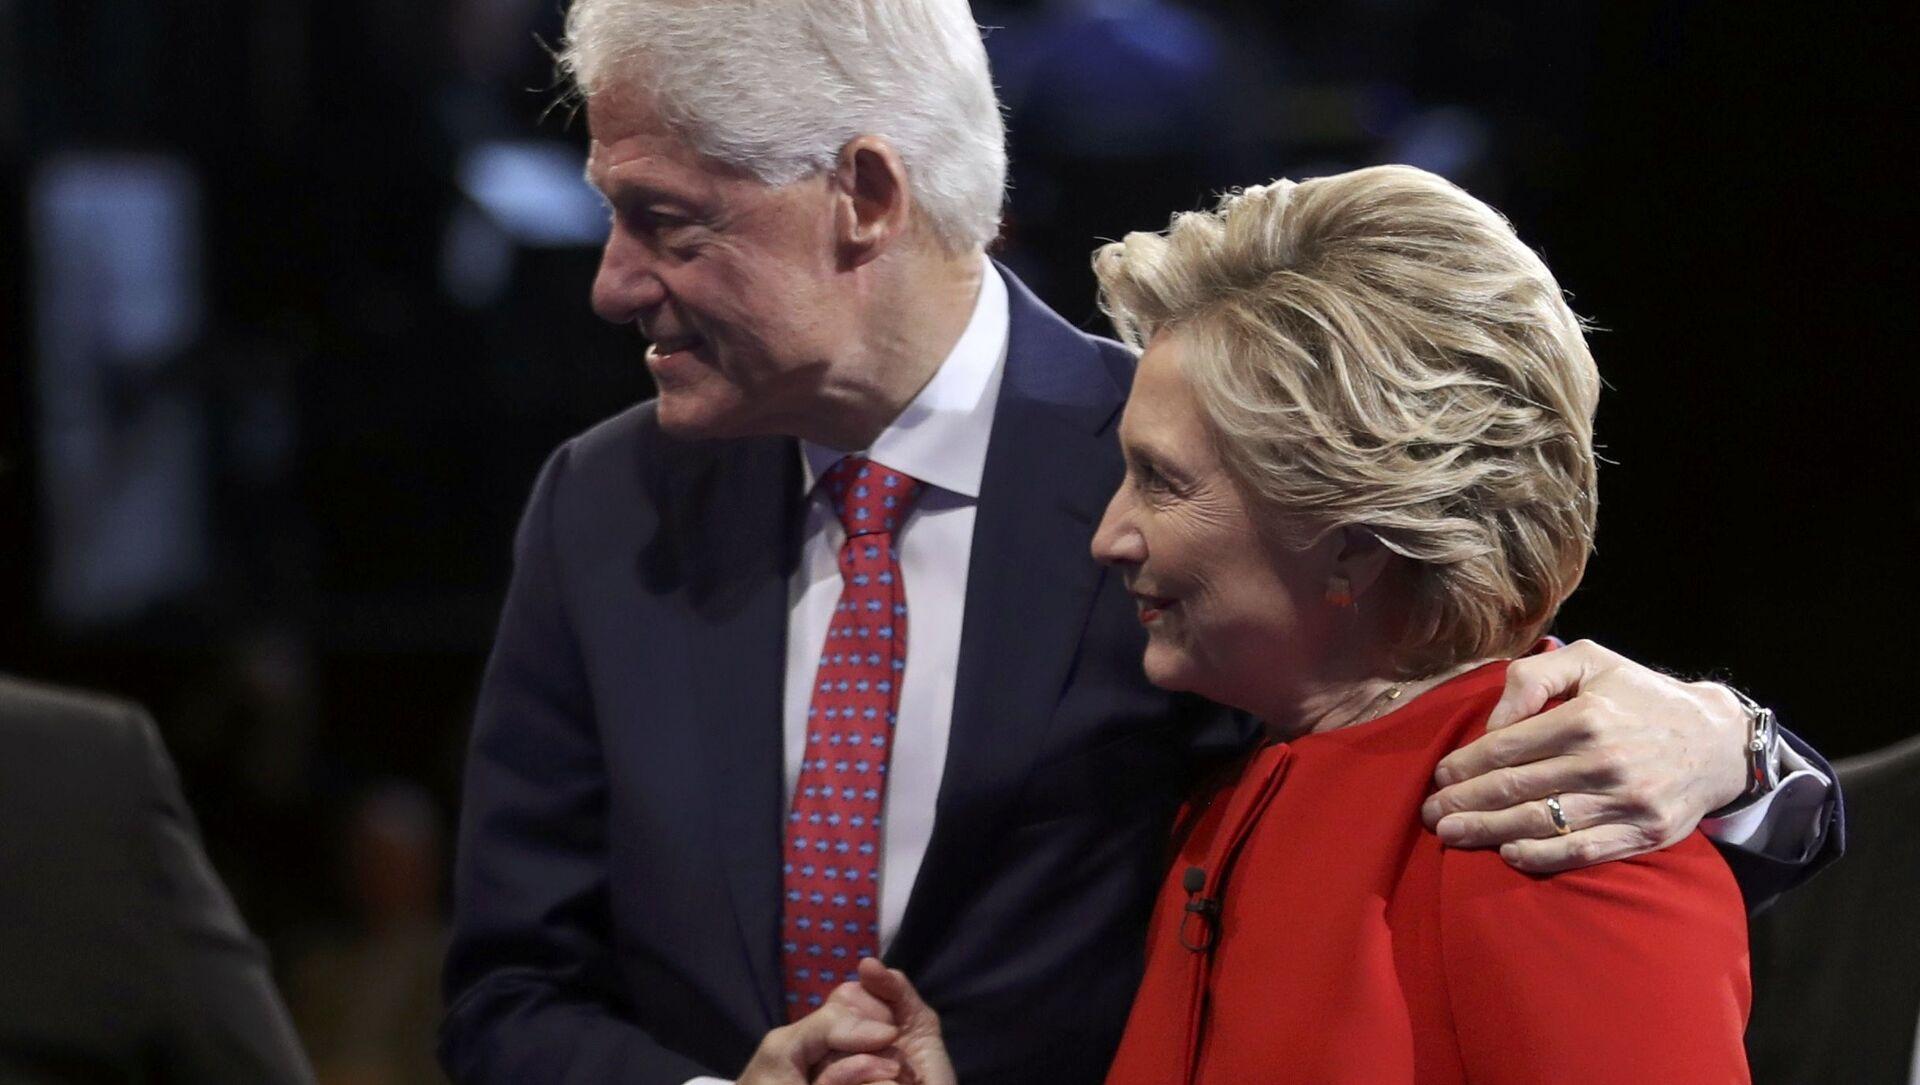 Kandydat na urząd prezydenta Hillary Clinton z mężem - Sputnik Polska, 1920, 22.03.2021